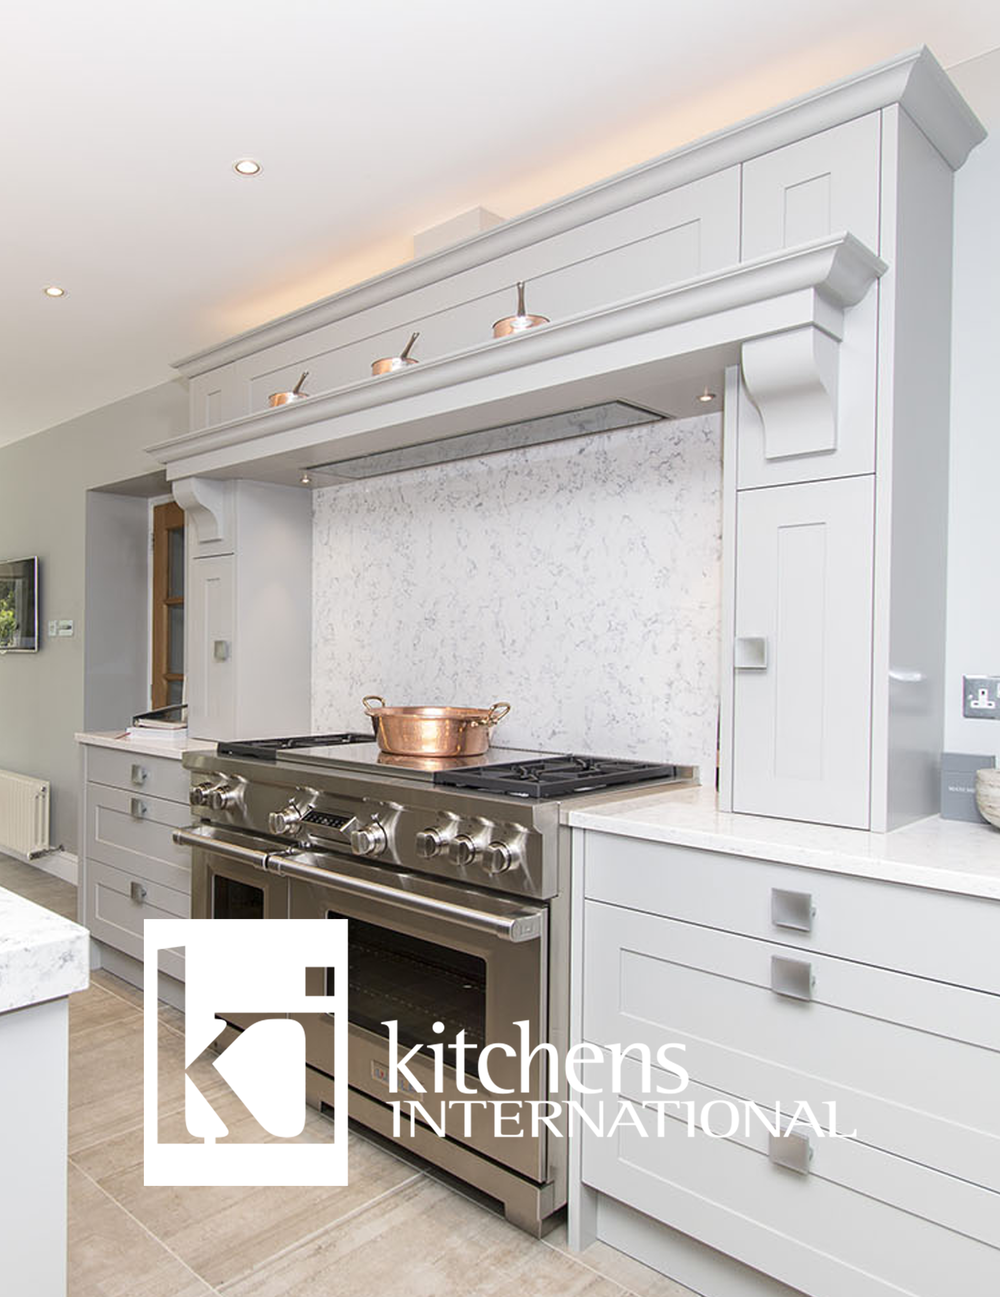 Kitchens International - October 2016